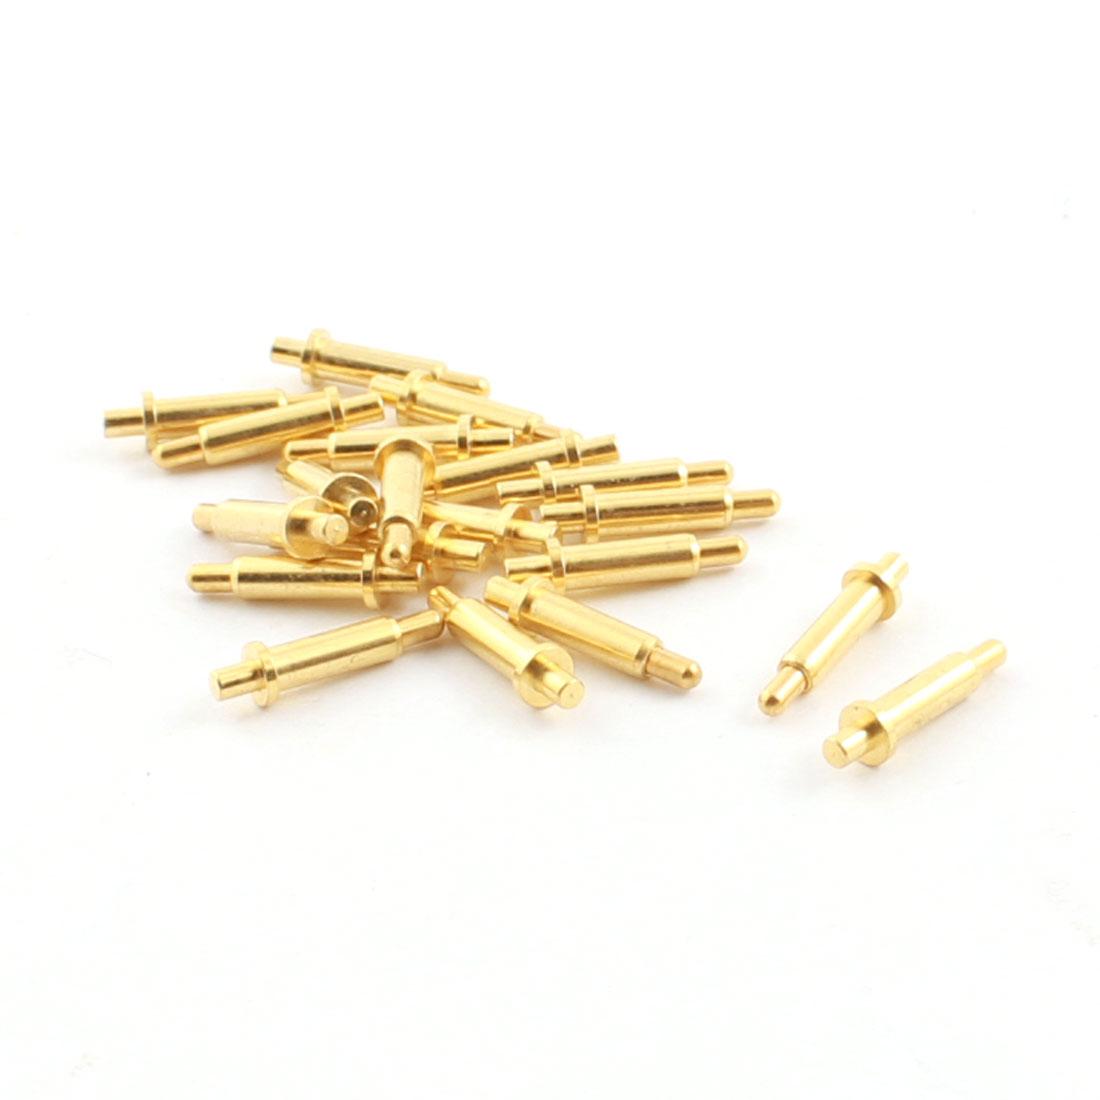 20Pcs Torx Head Tip Mini Gold Tone Metal Spring Test Pin Probe 1.4mm Dia 11mm Length